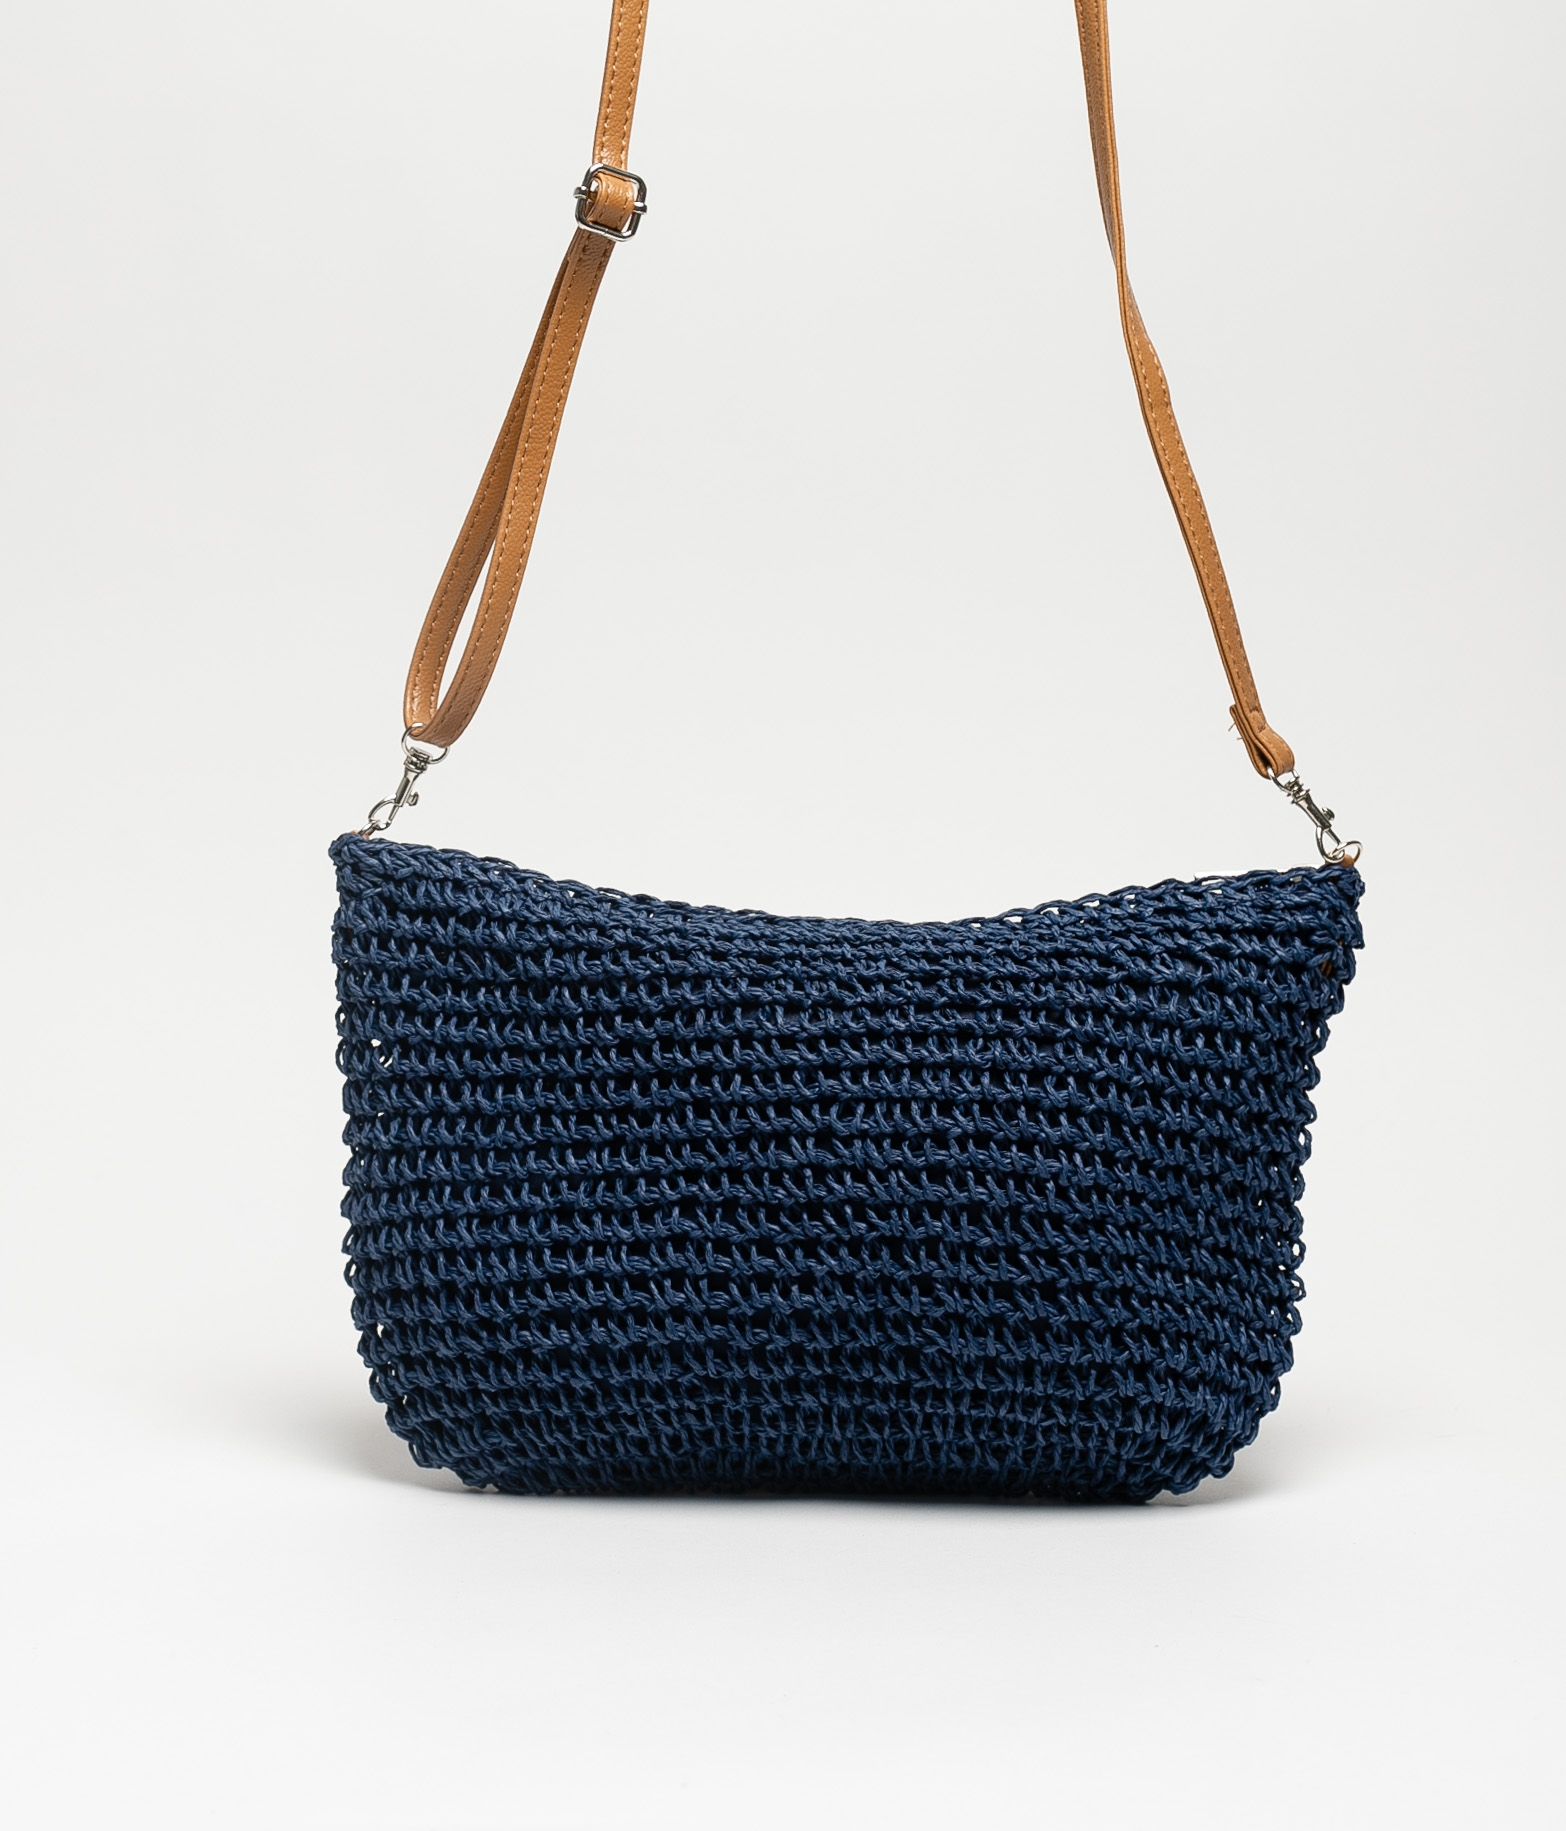 HELA WALLET - NAVY BLUE